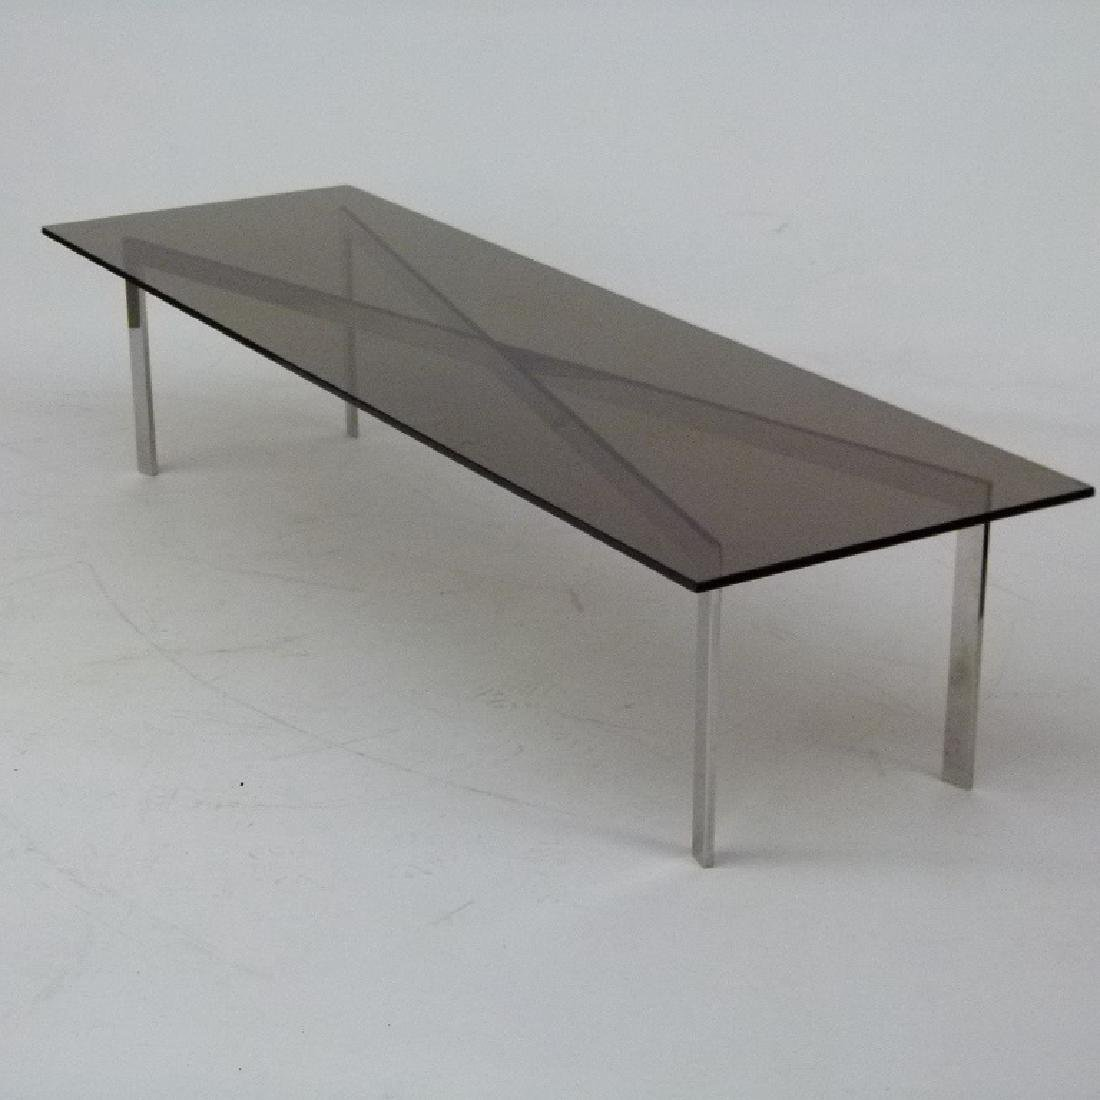 ART MODERN CHROME/GLASS COFFEE TABLE, 20TH C.